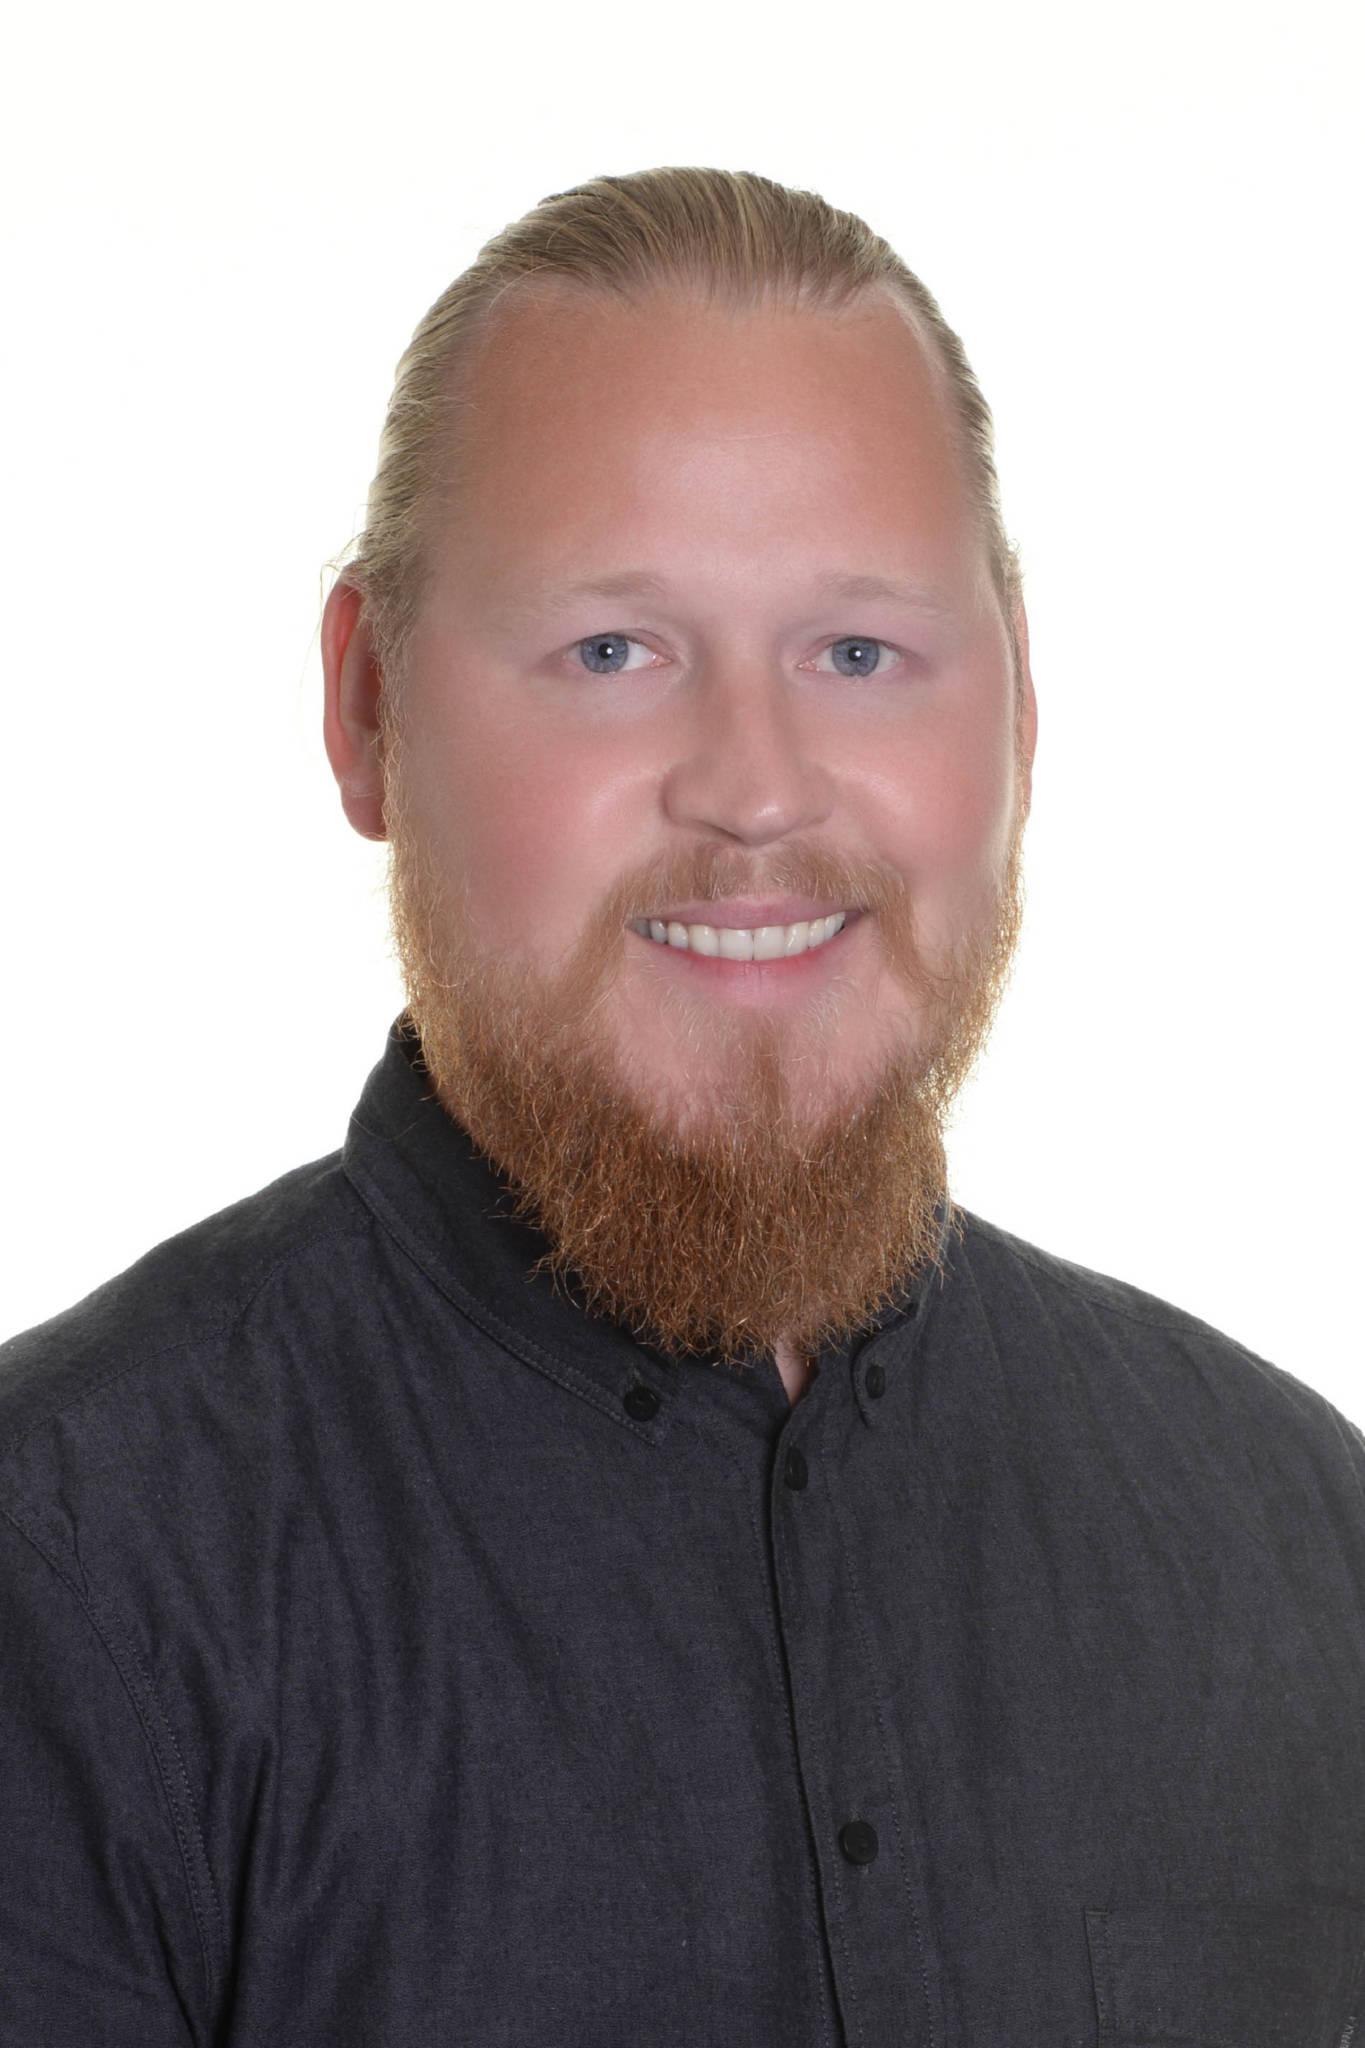 Casper Cantzler Christensen, CC